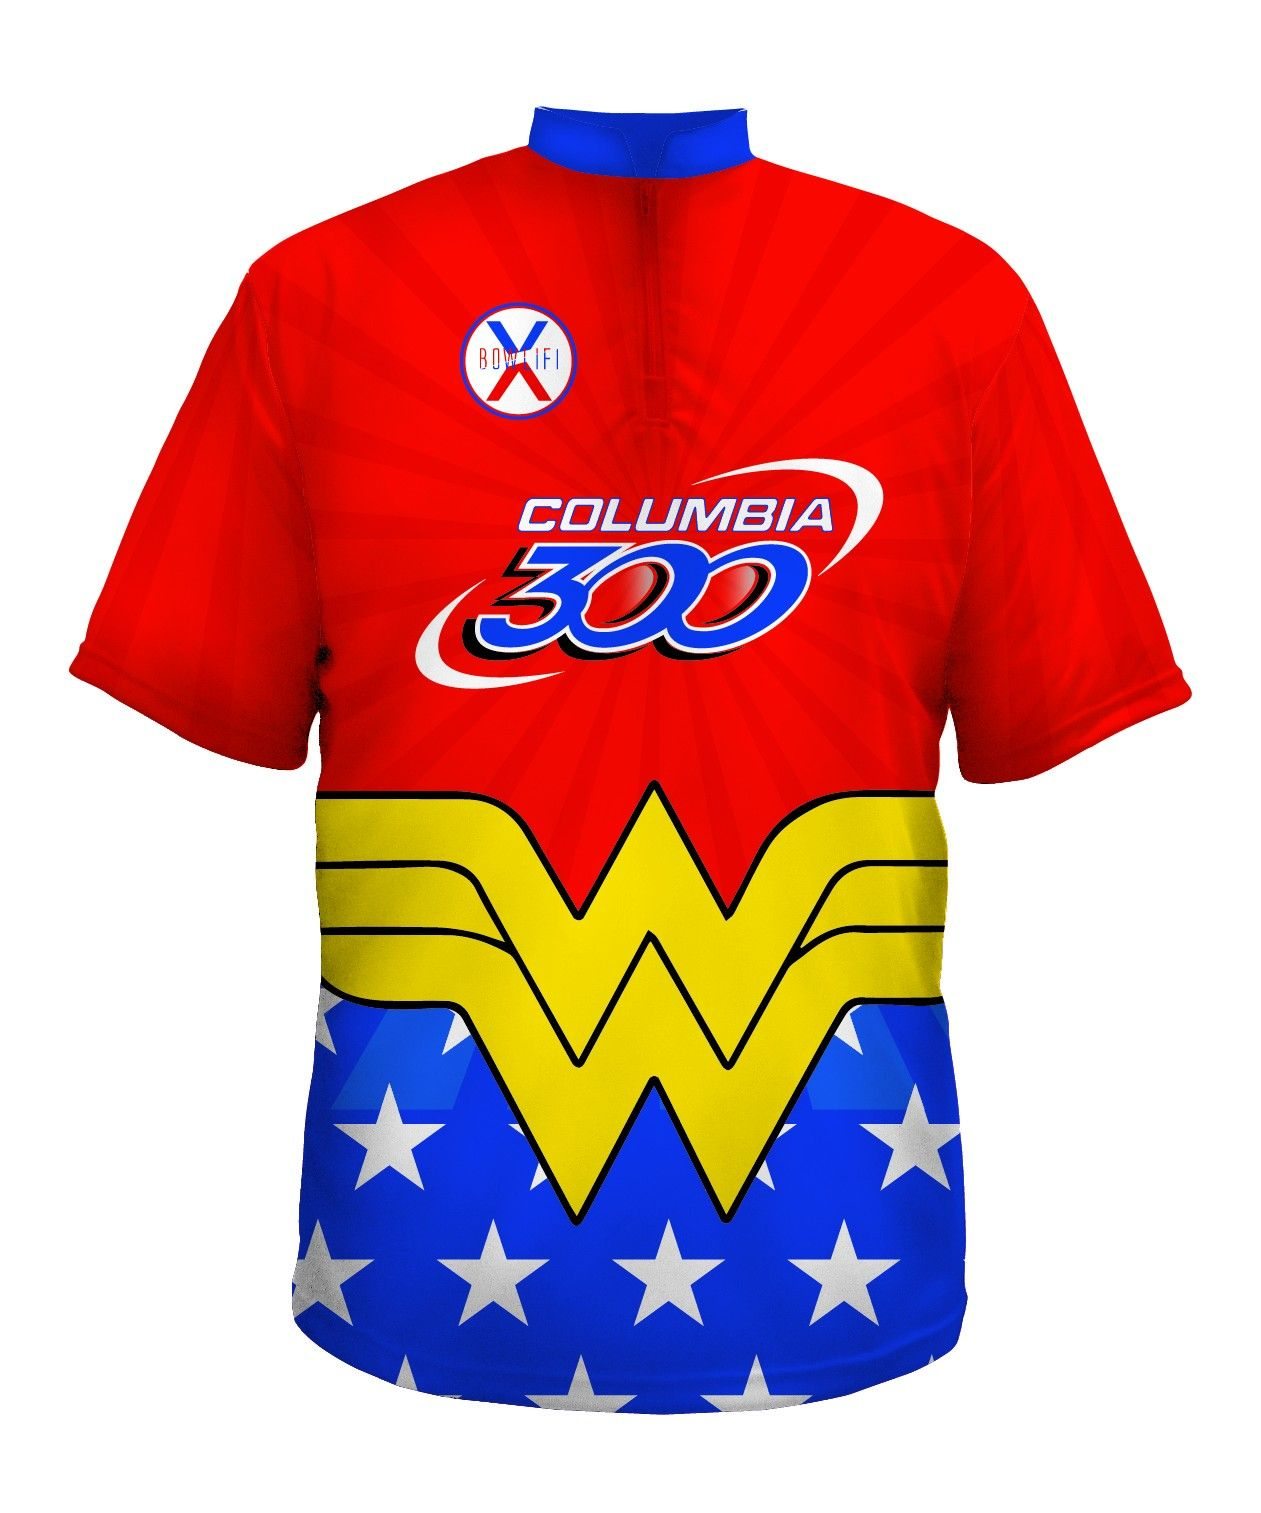 60c27ff9b Bowling Jerseys Wonder Woman - All Designs - Existing Designs - Shop Bowlifi